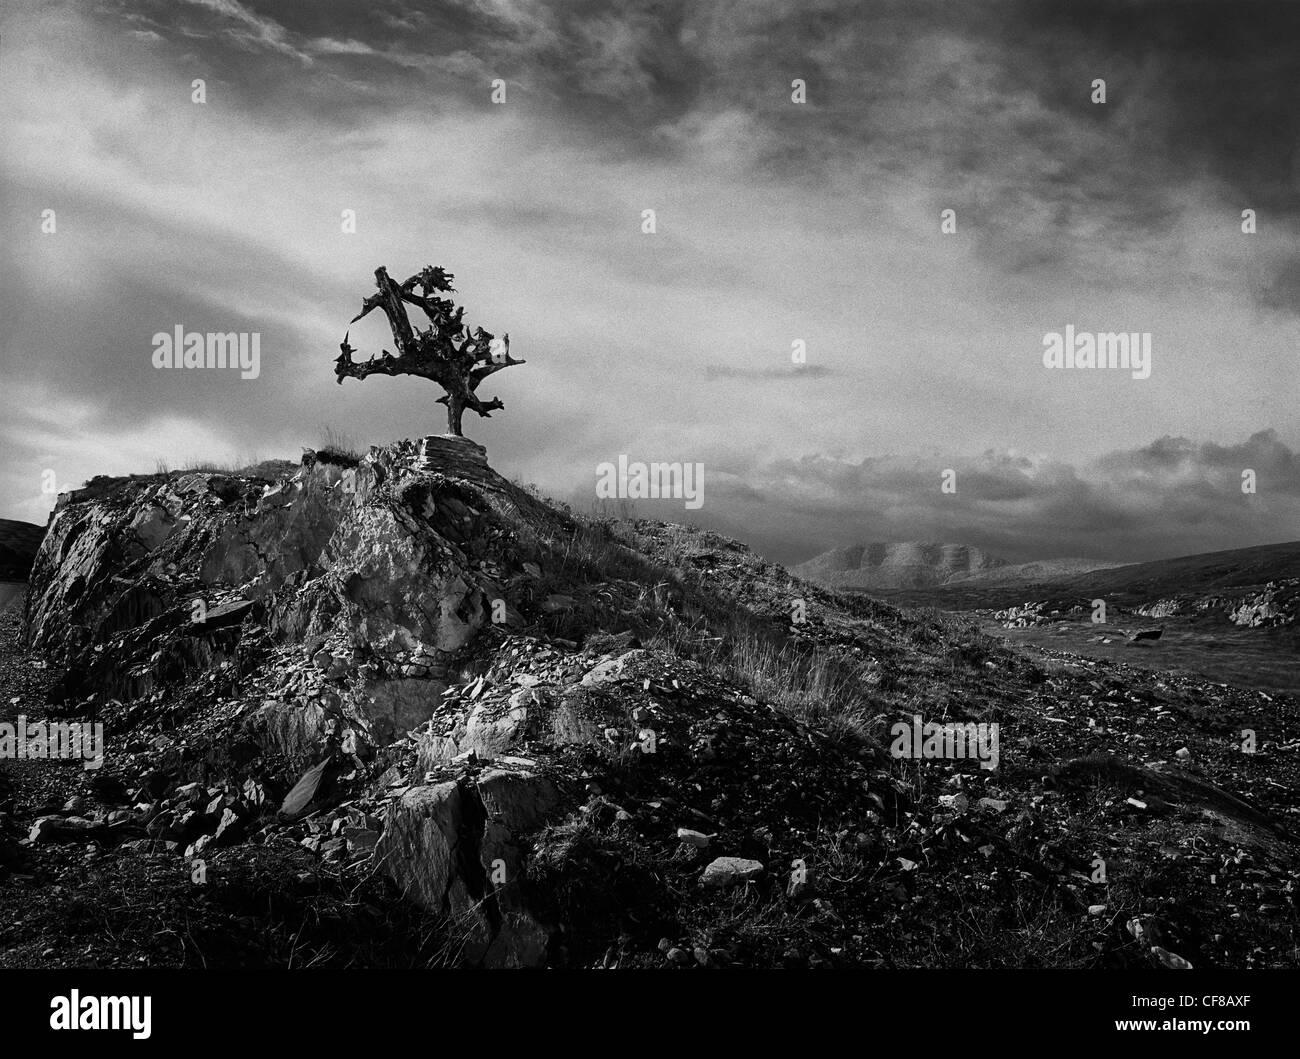 A piece of Bog Oak erected in the landscape, West Cork, Ireland. - Stock Image